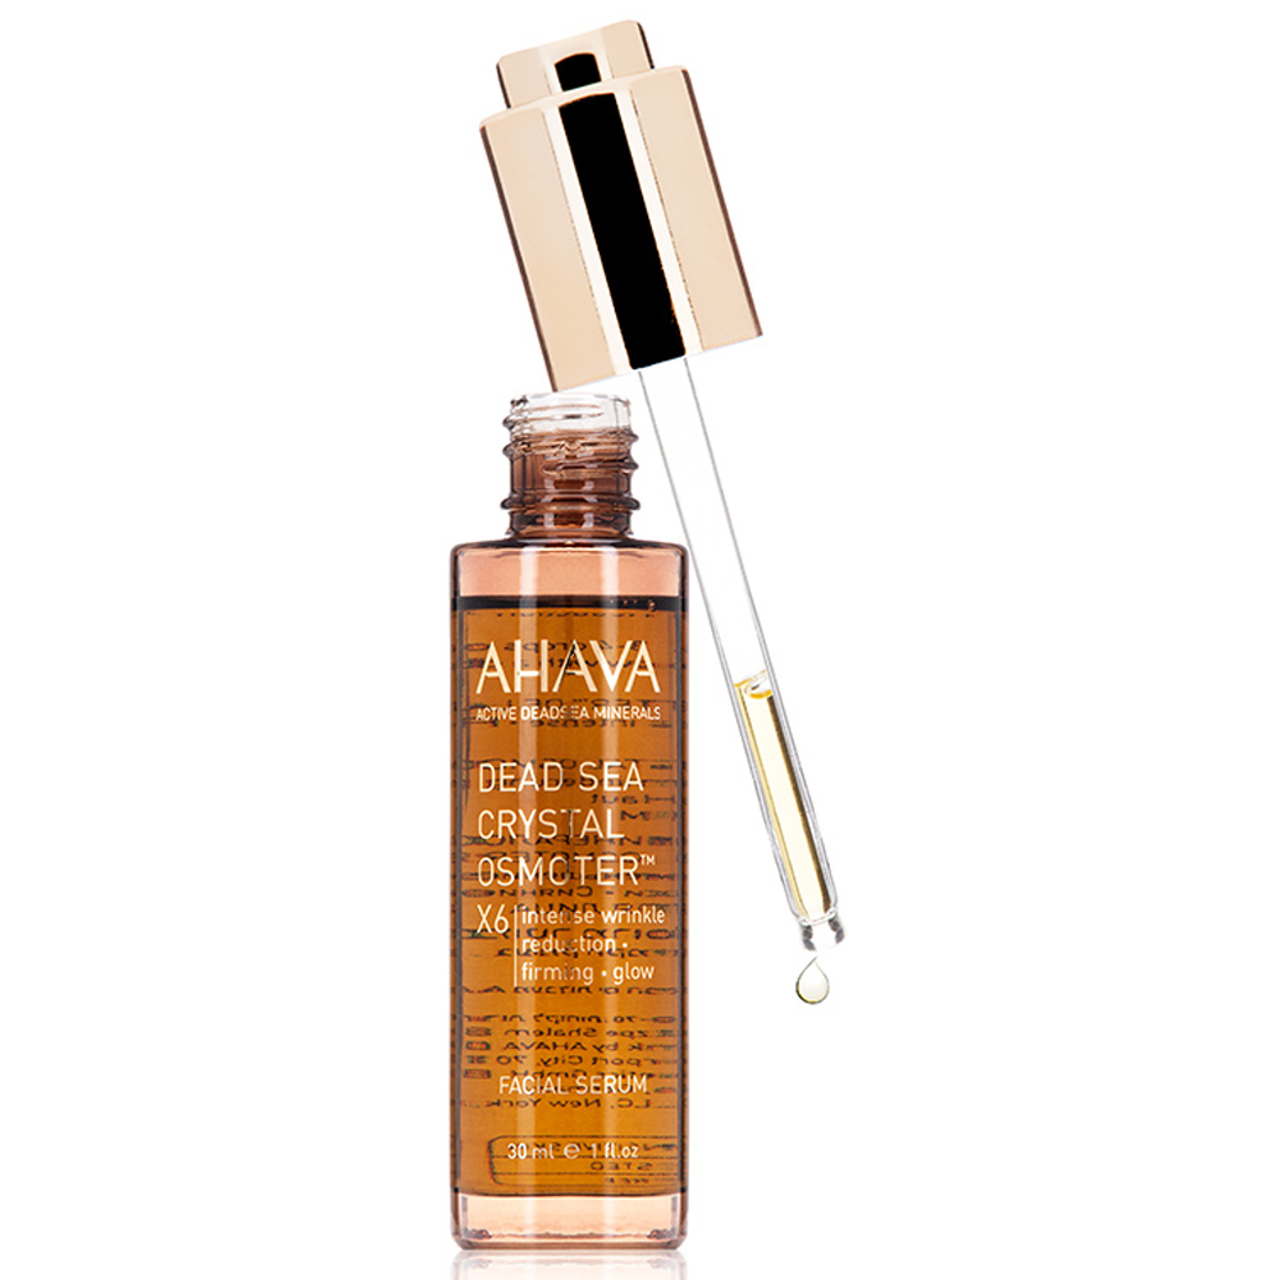 AHAVA Dead See Crystal Osmoter X6 Facial Serum